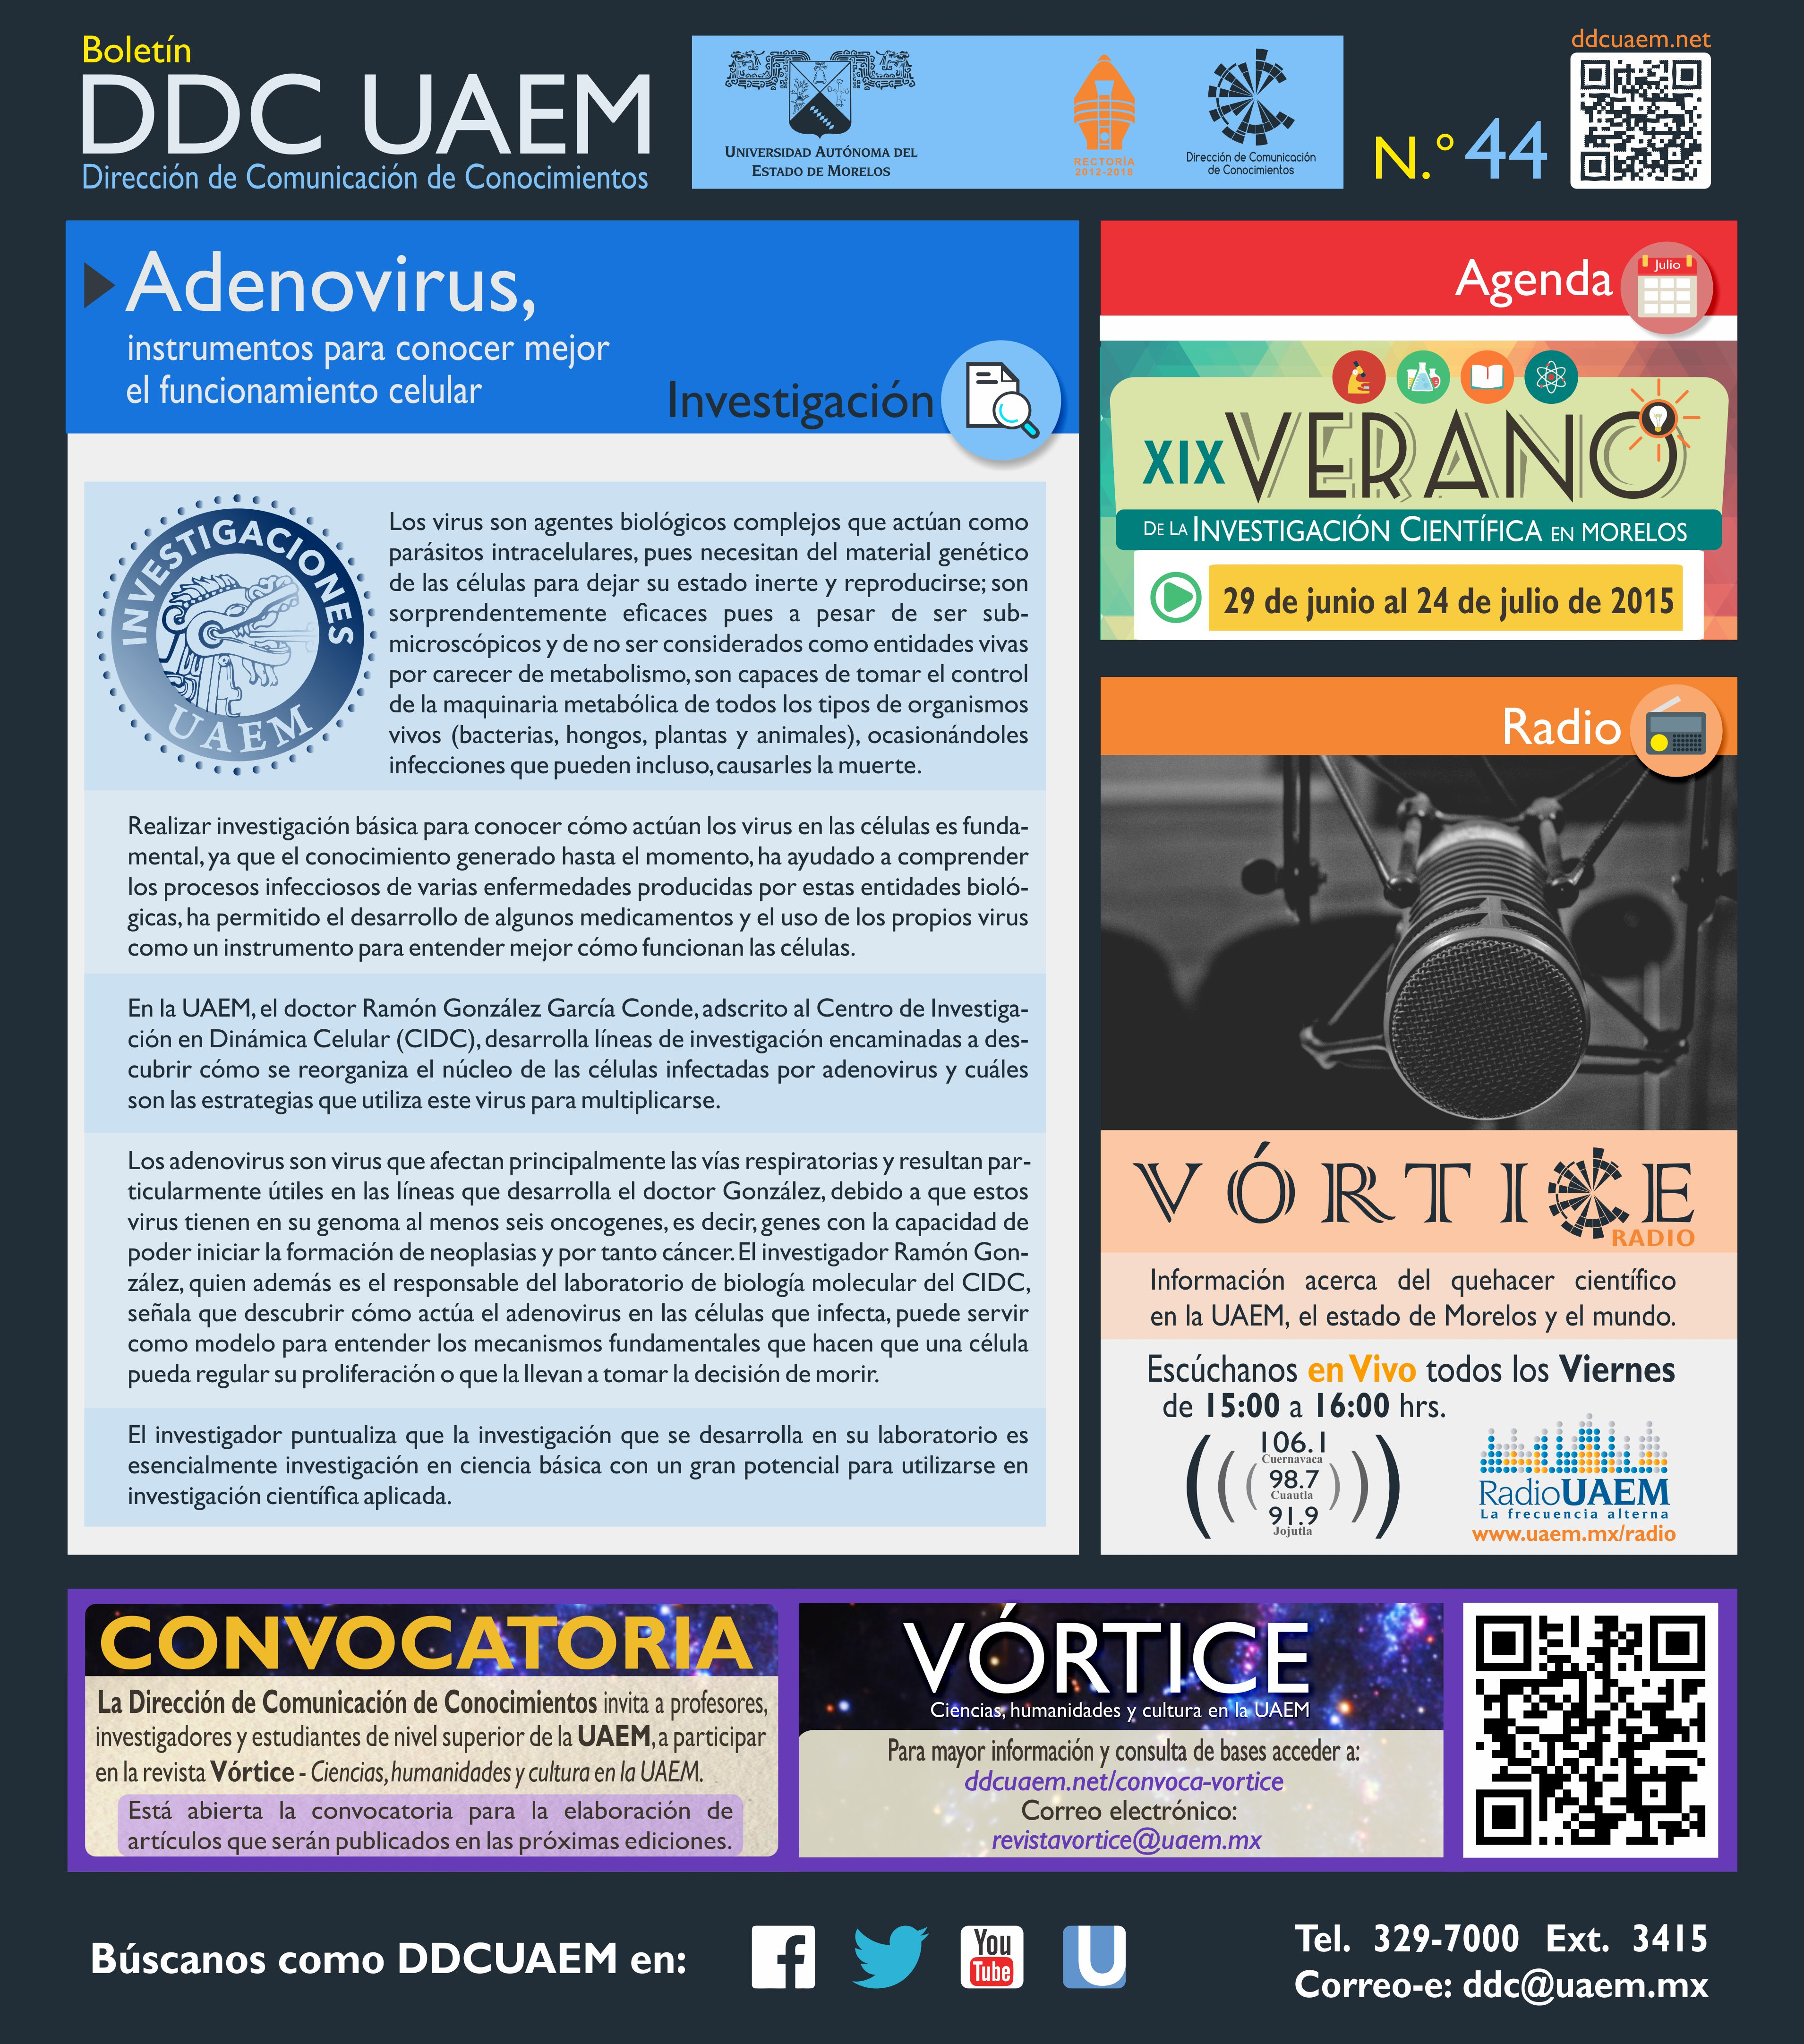 Boletín DDC 44 - RS